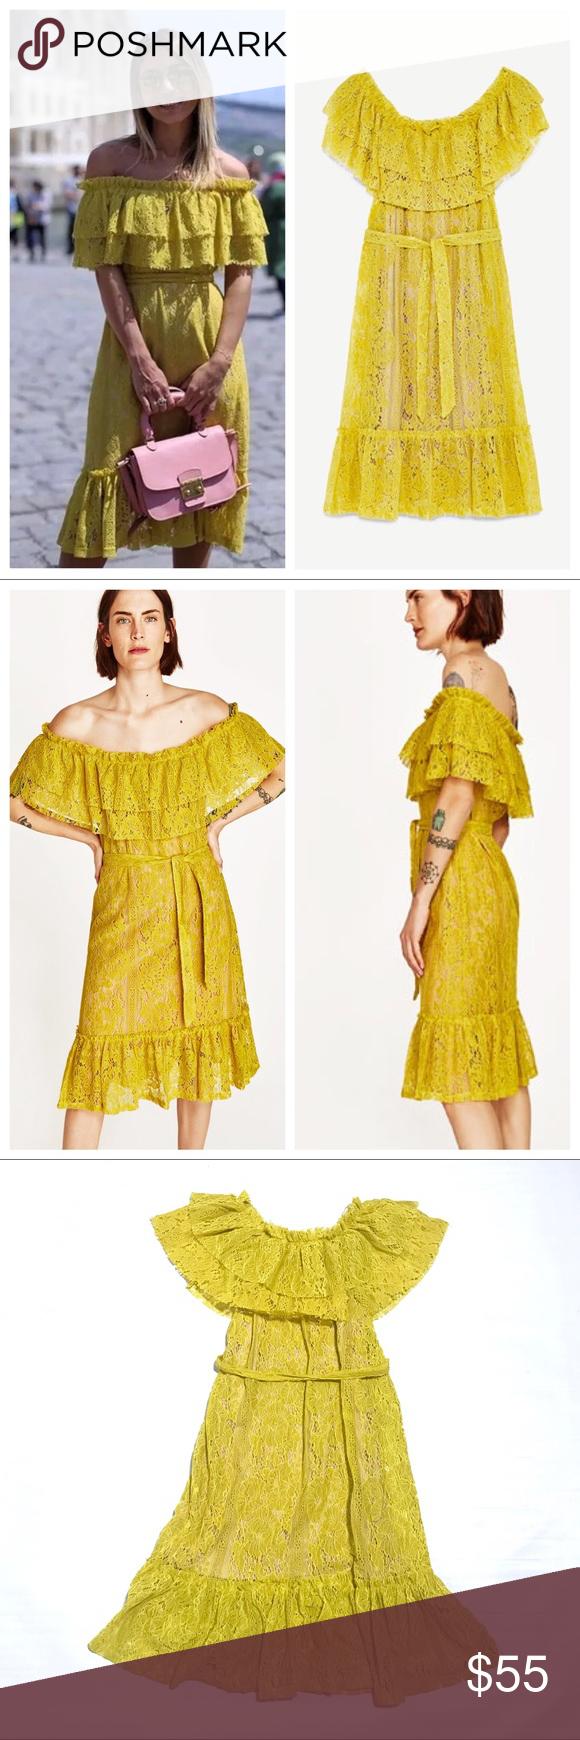 Nwt zara yellow lace dress s small nwt my posh picks pinterest